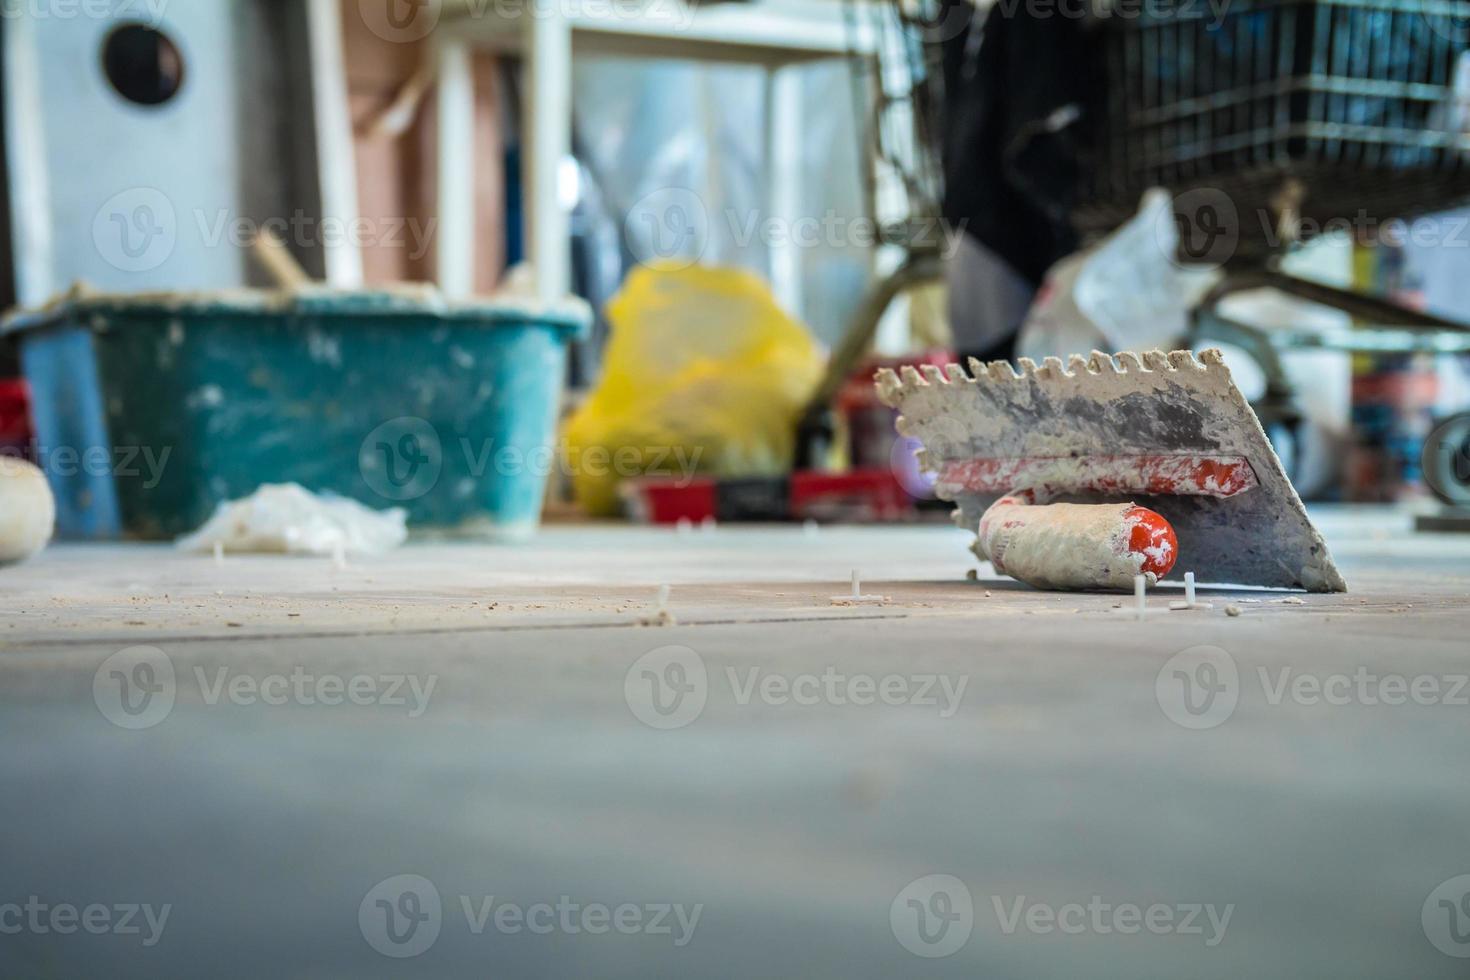 murslev på golvet på byggarbetsplatsen foto